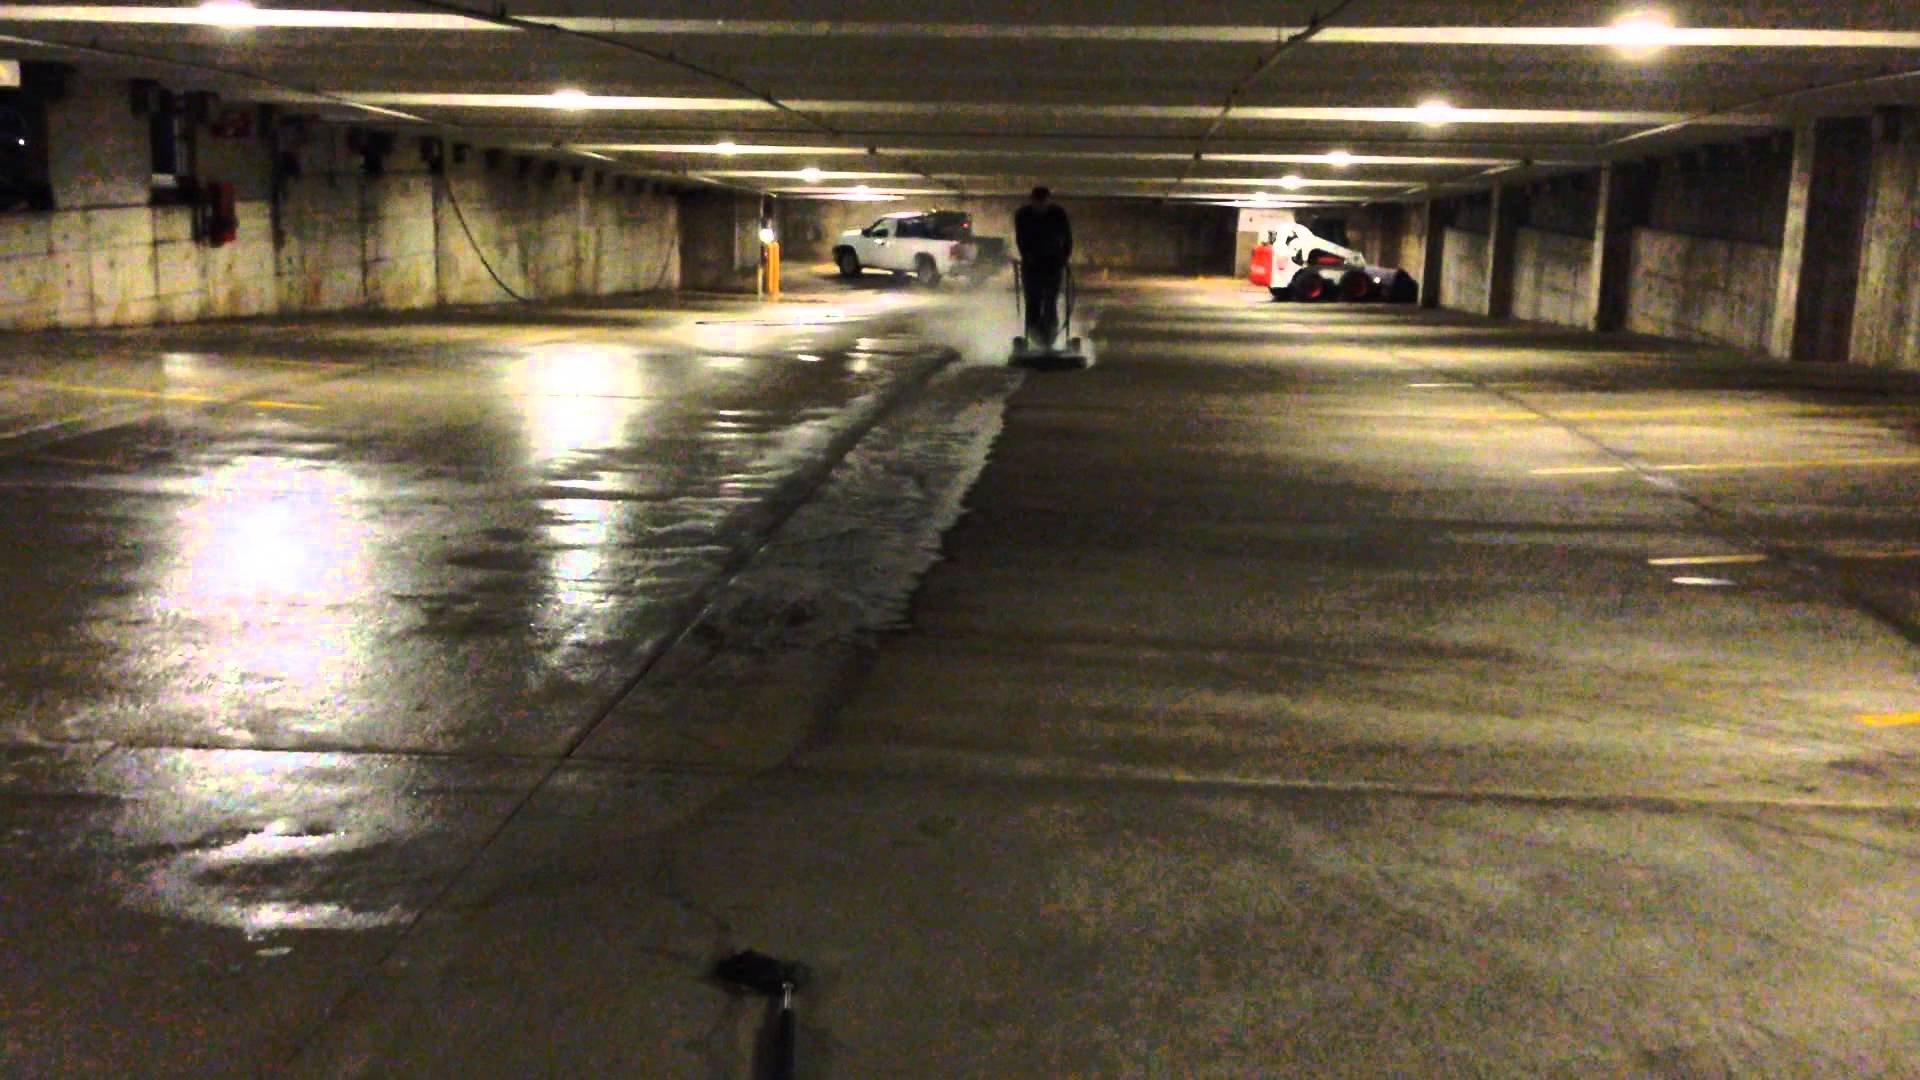 Parking Garage Pressure Washing Definitive Pressure Washing